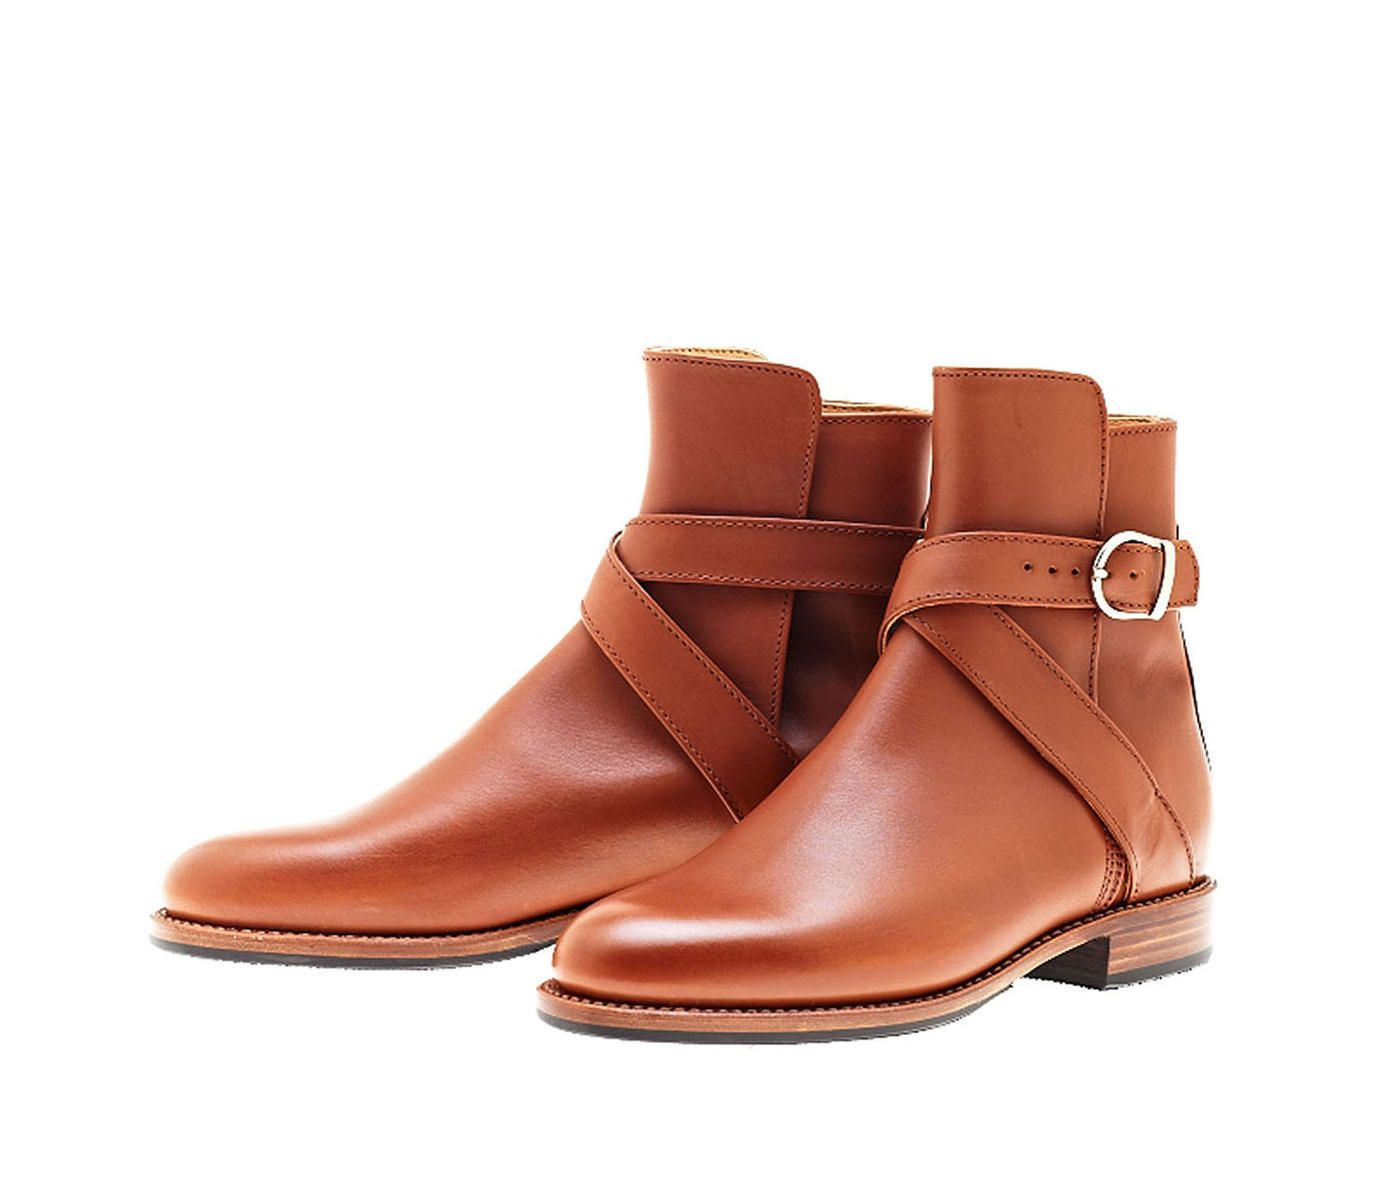 cole haan shoes de hombre sandalias gladiators fighting wiki 711